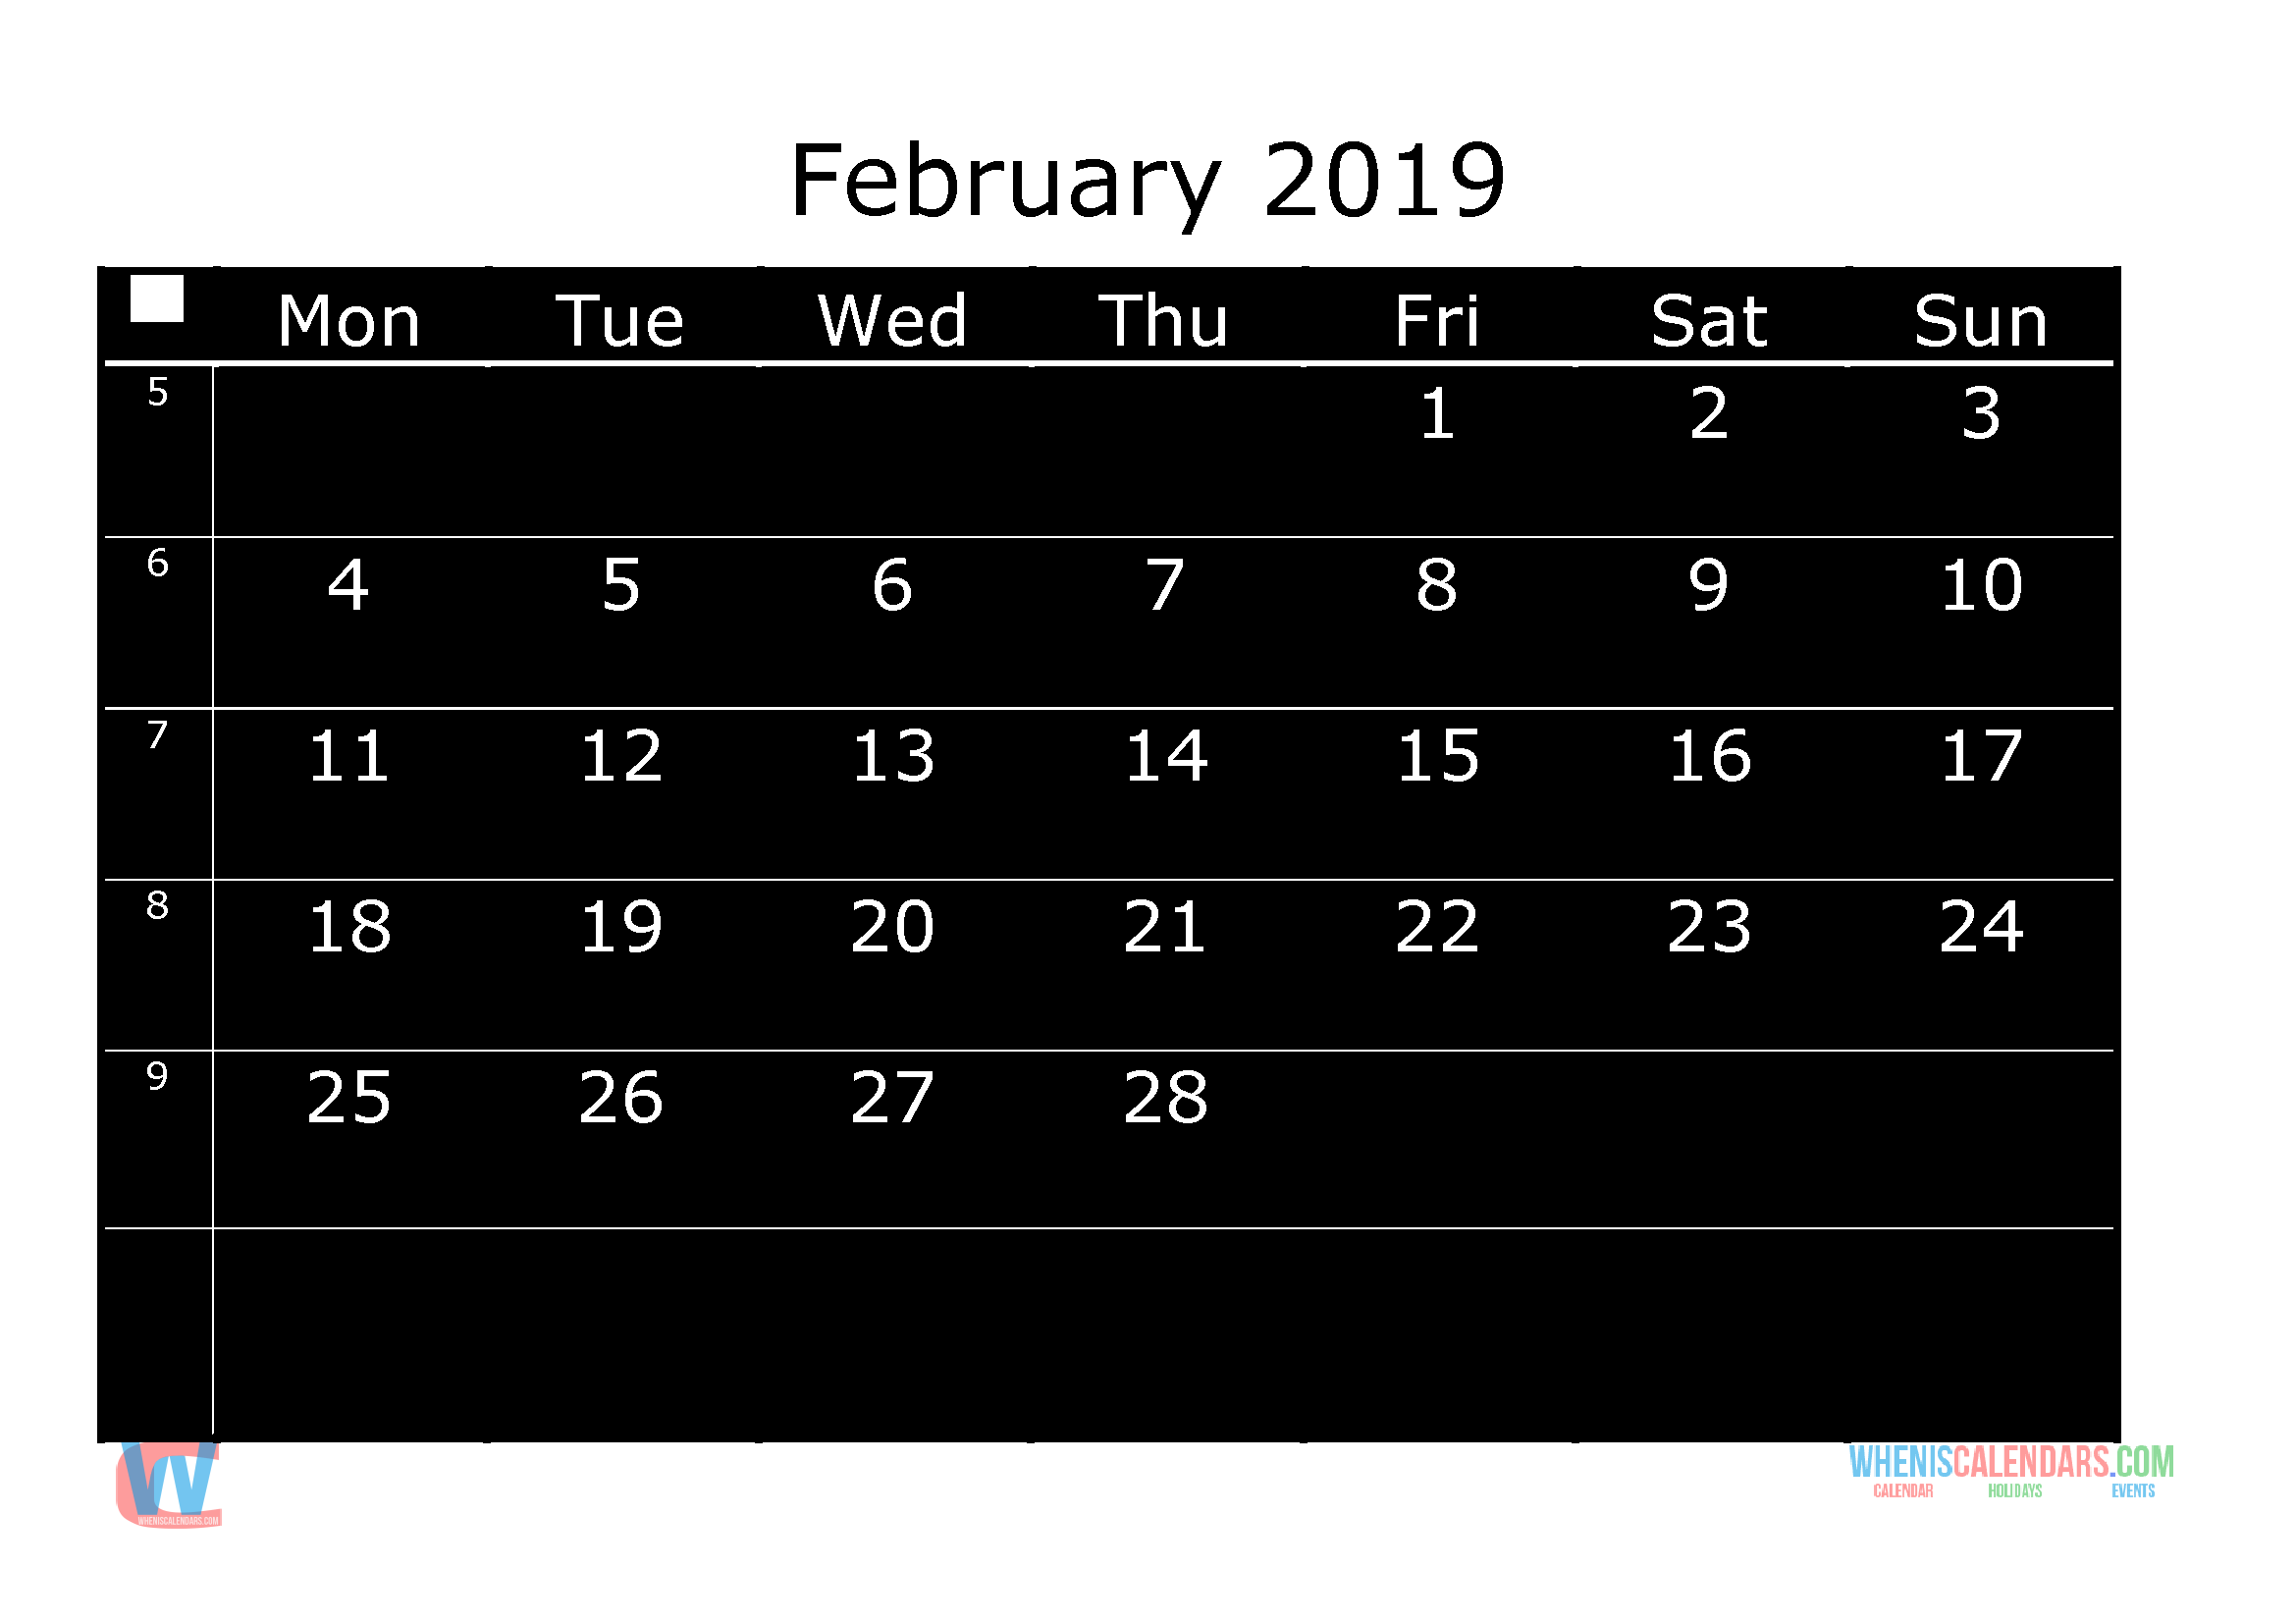 Wheniscalendars February 2019 February 2019 Printable Calendar with Week Numbers Monday Starts